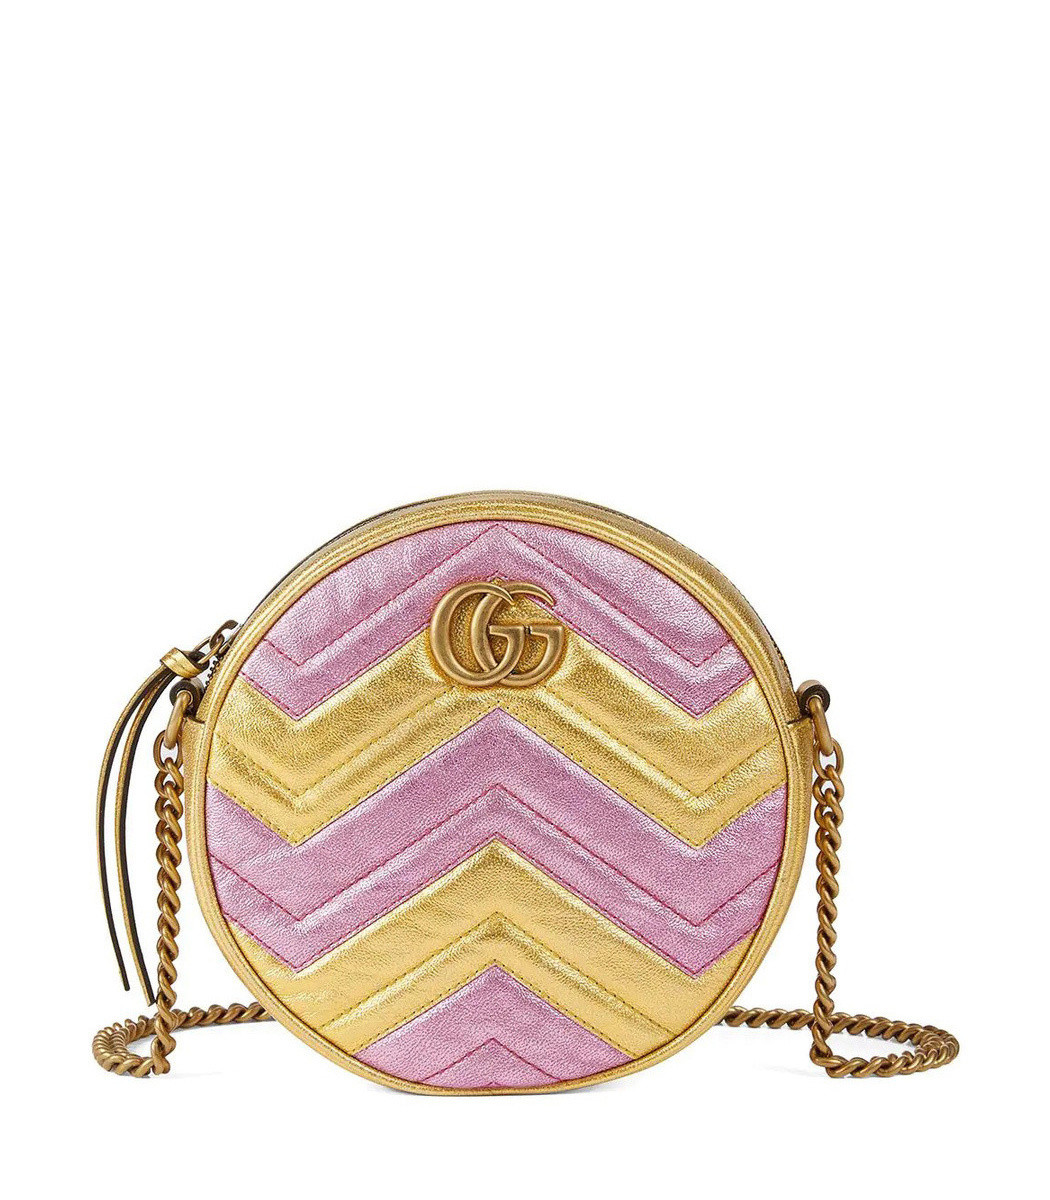 013f58573bff21 Home / Gucci / GG Marmont Round Shoulder Bag. prev